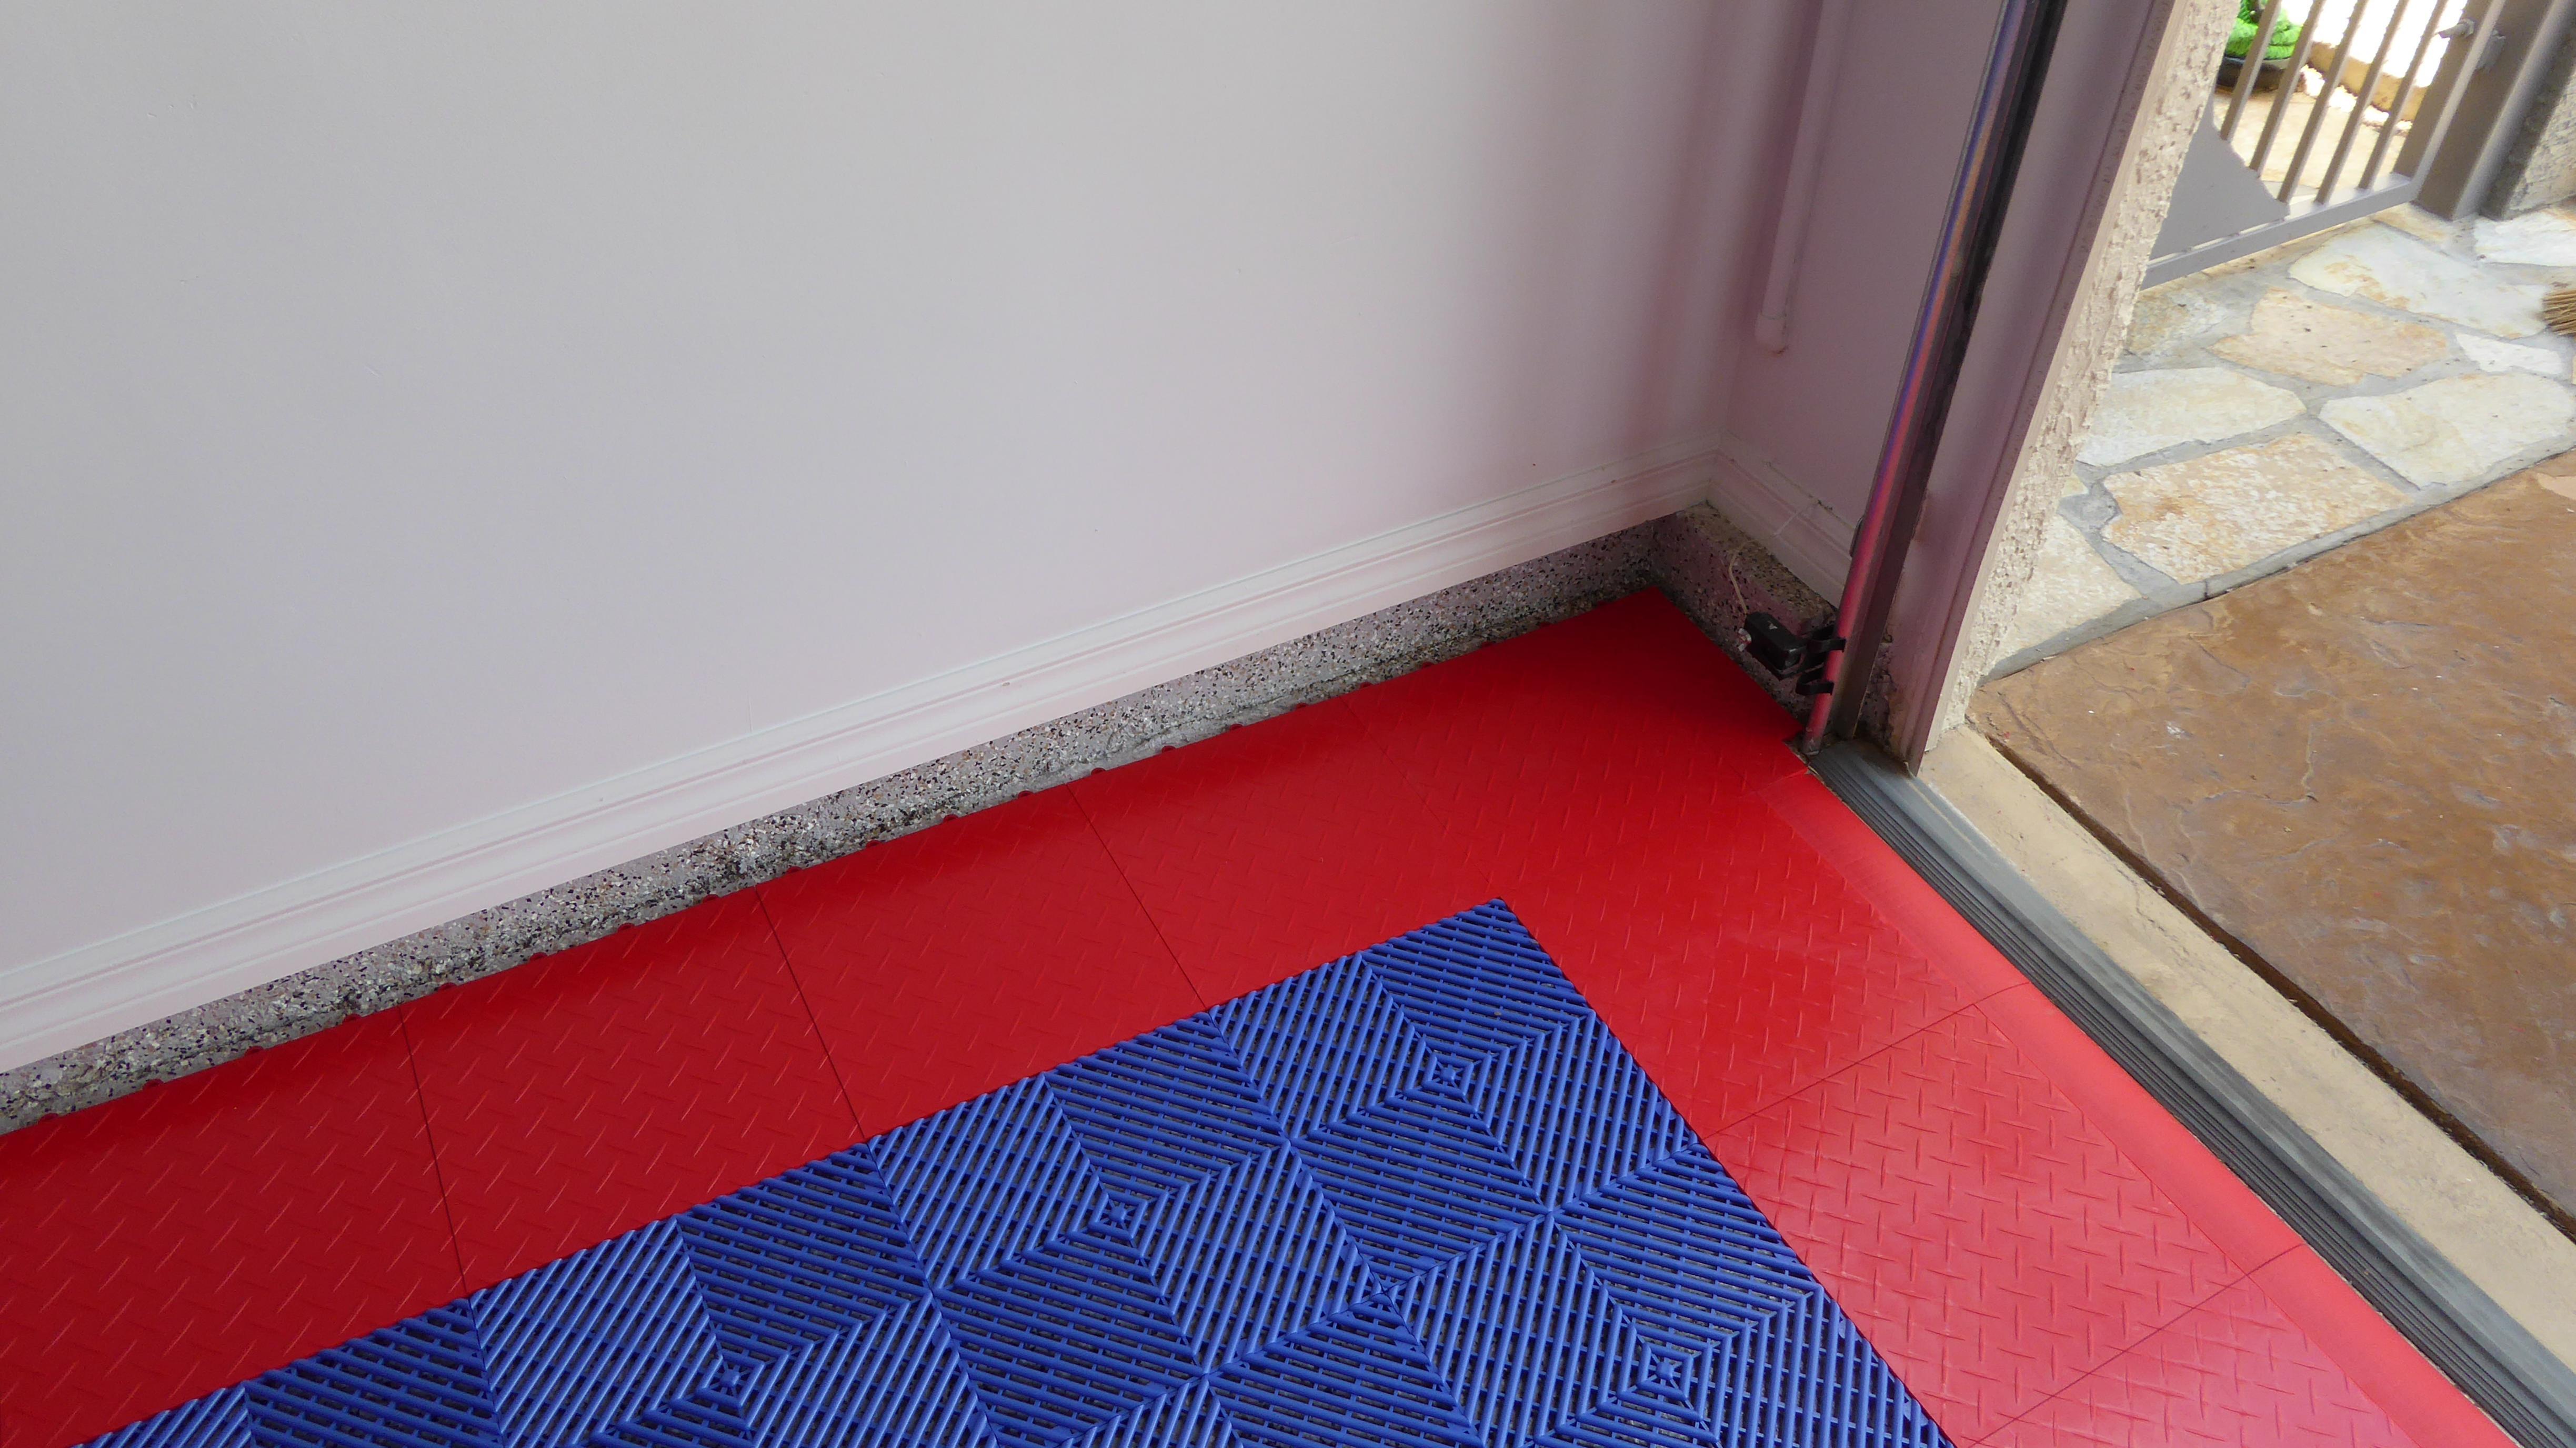 Installing racedeck garage flooring name p1050232g views 2693 size 103 dailygadgetfo Image collections